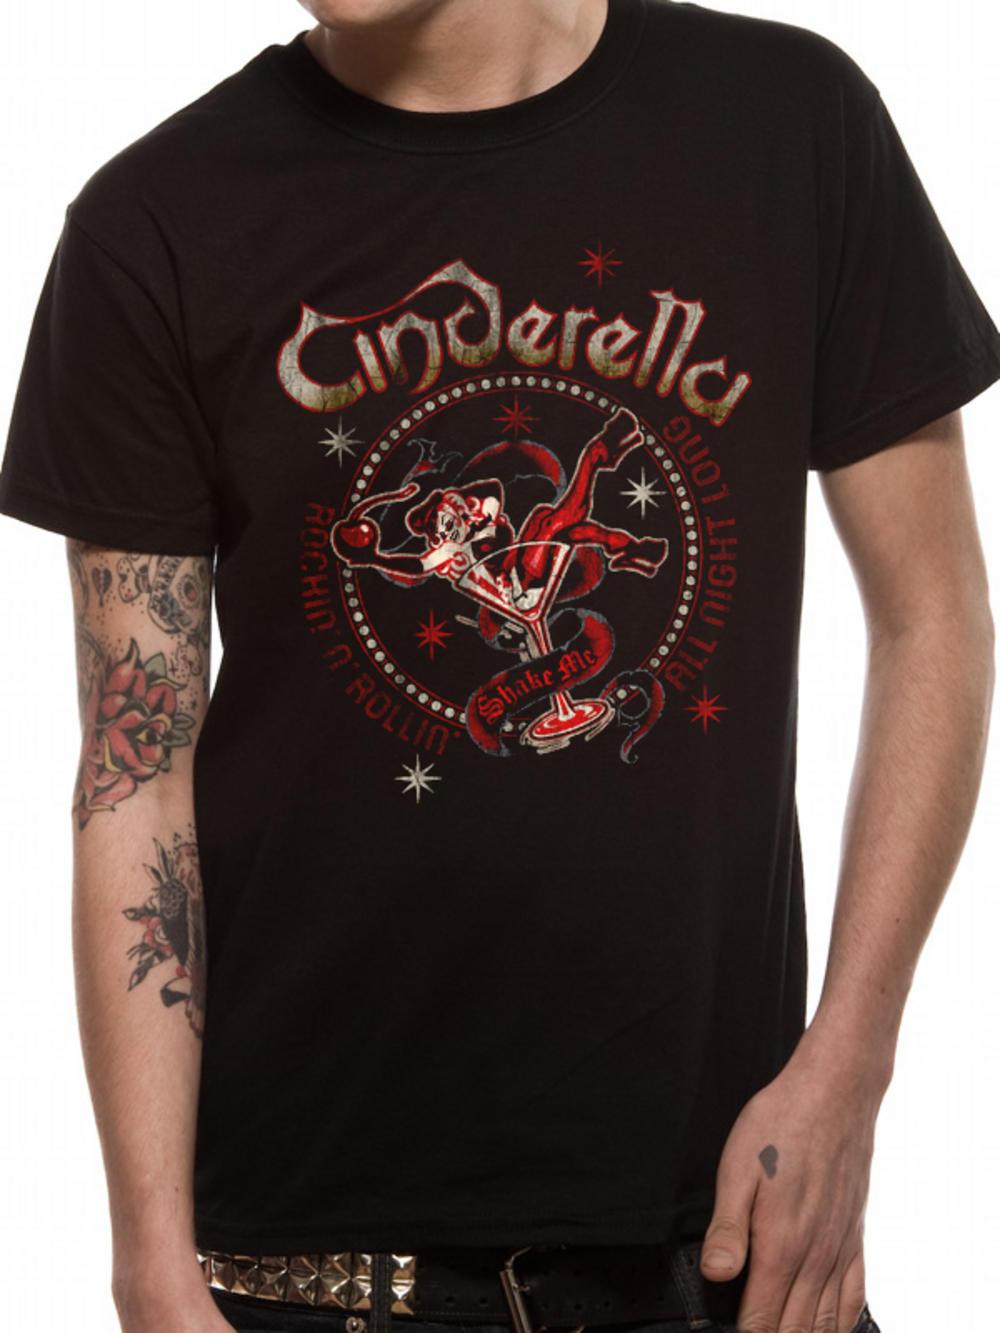 Cinderella shake me t shirt tm shop for Band t shirt designs for sale